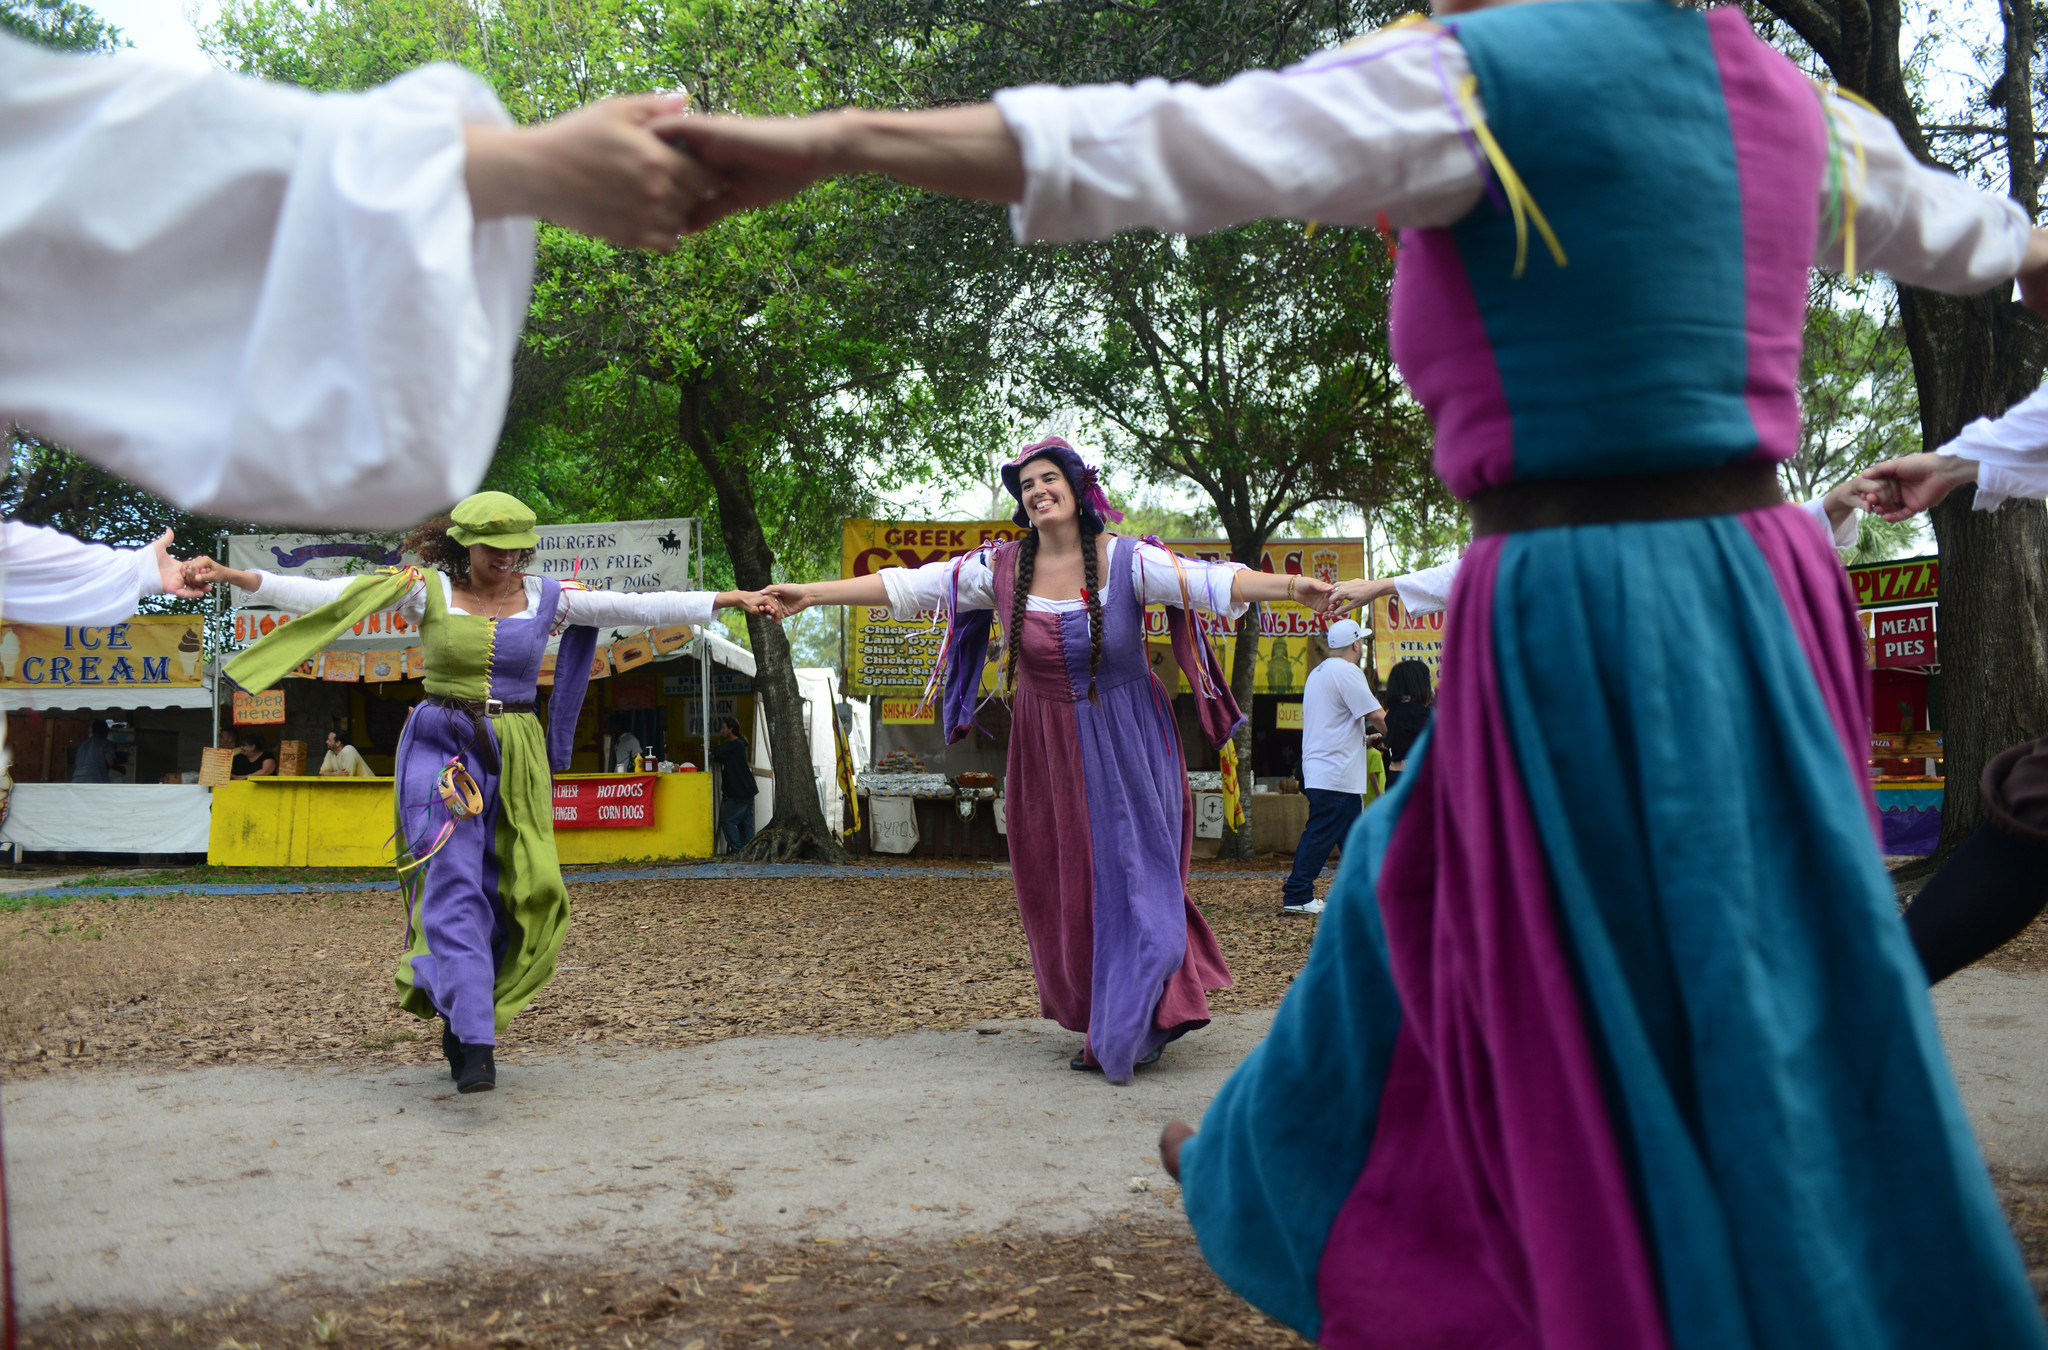 Renaissance Festival photos - Revelers Round